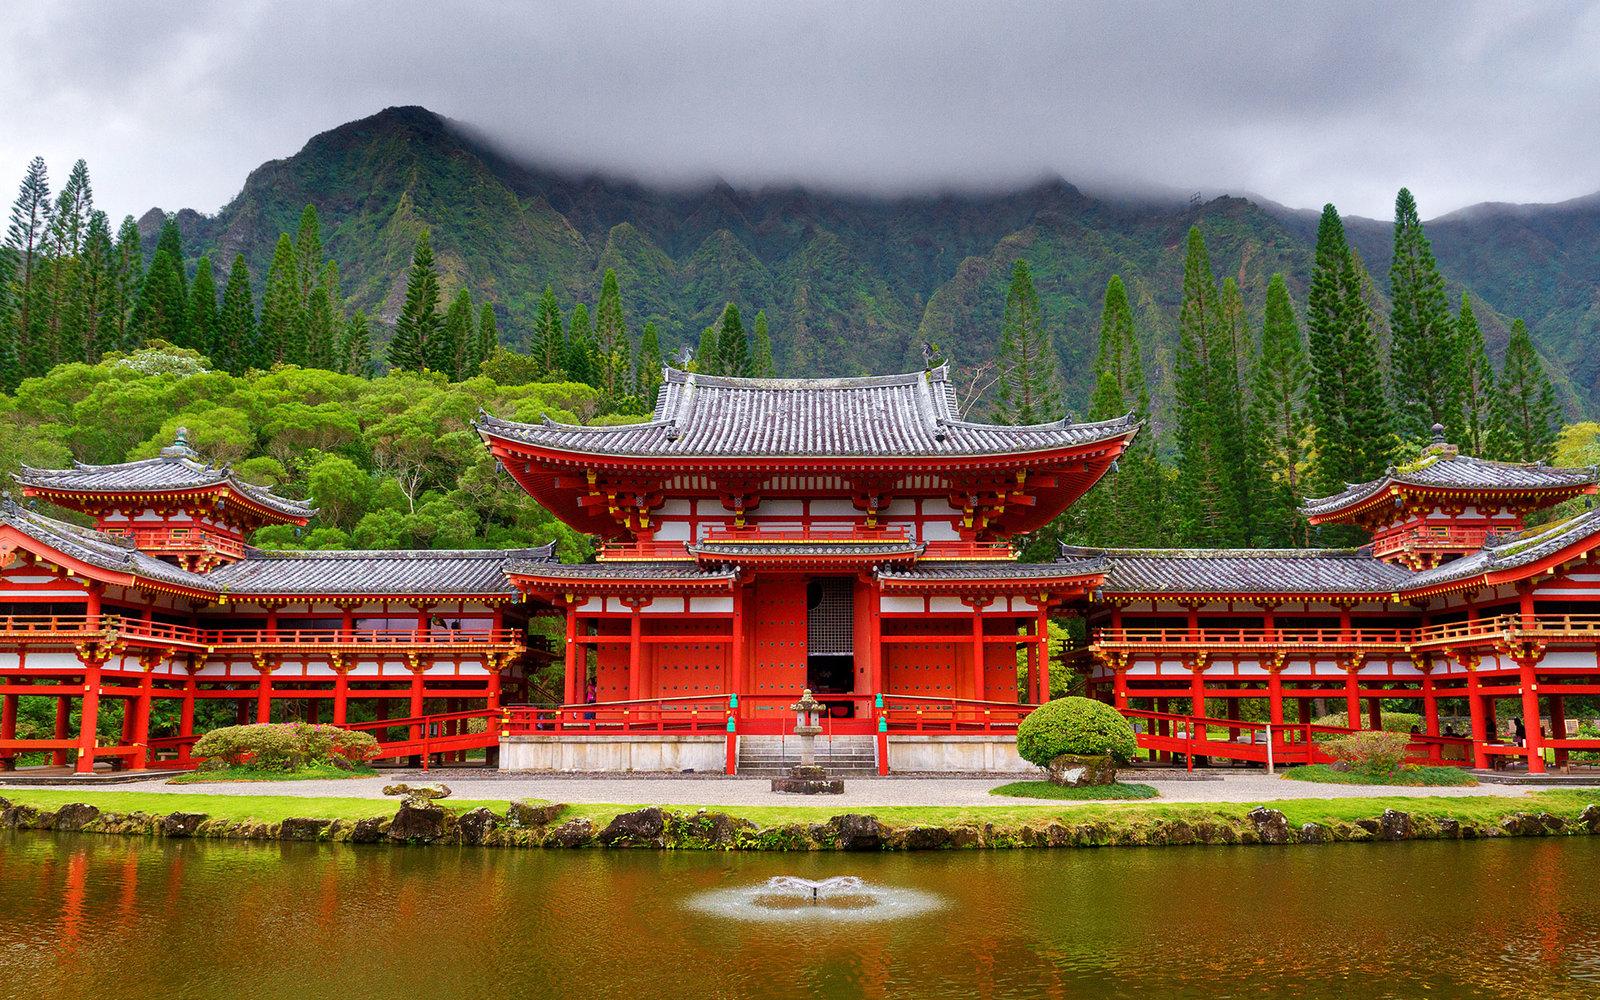 Https 2016 03 31 Politics Gallery Donald Trump Quotes Coach Sawyer Tote Zipper Red Tas Wanita Merah 160330153344 09 Japan Temples